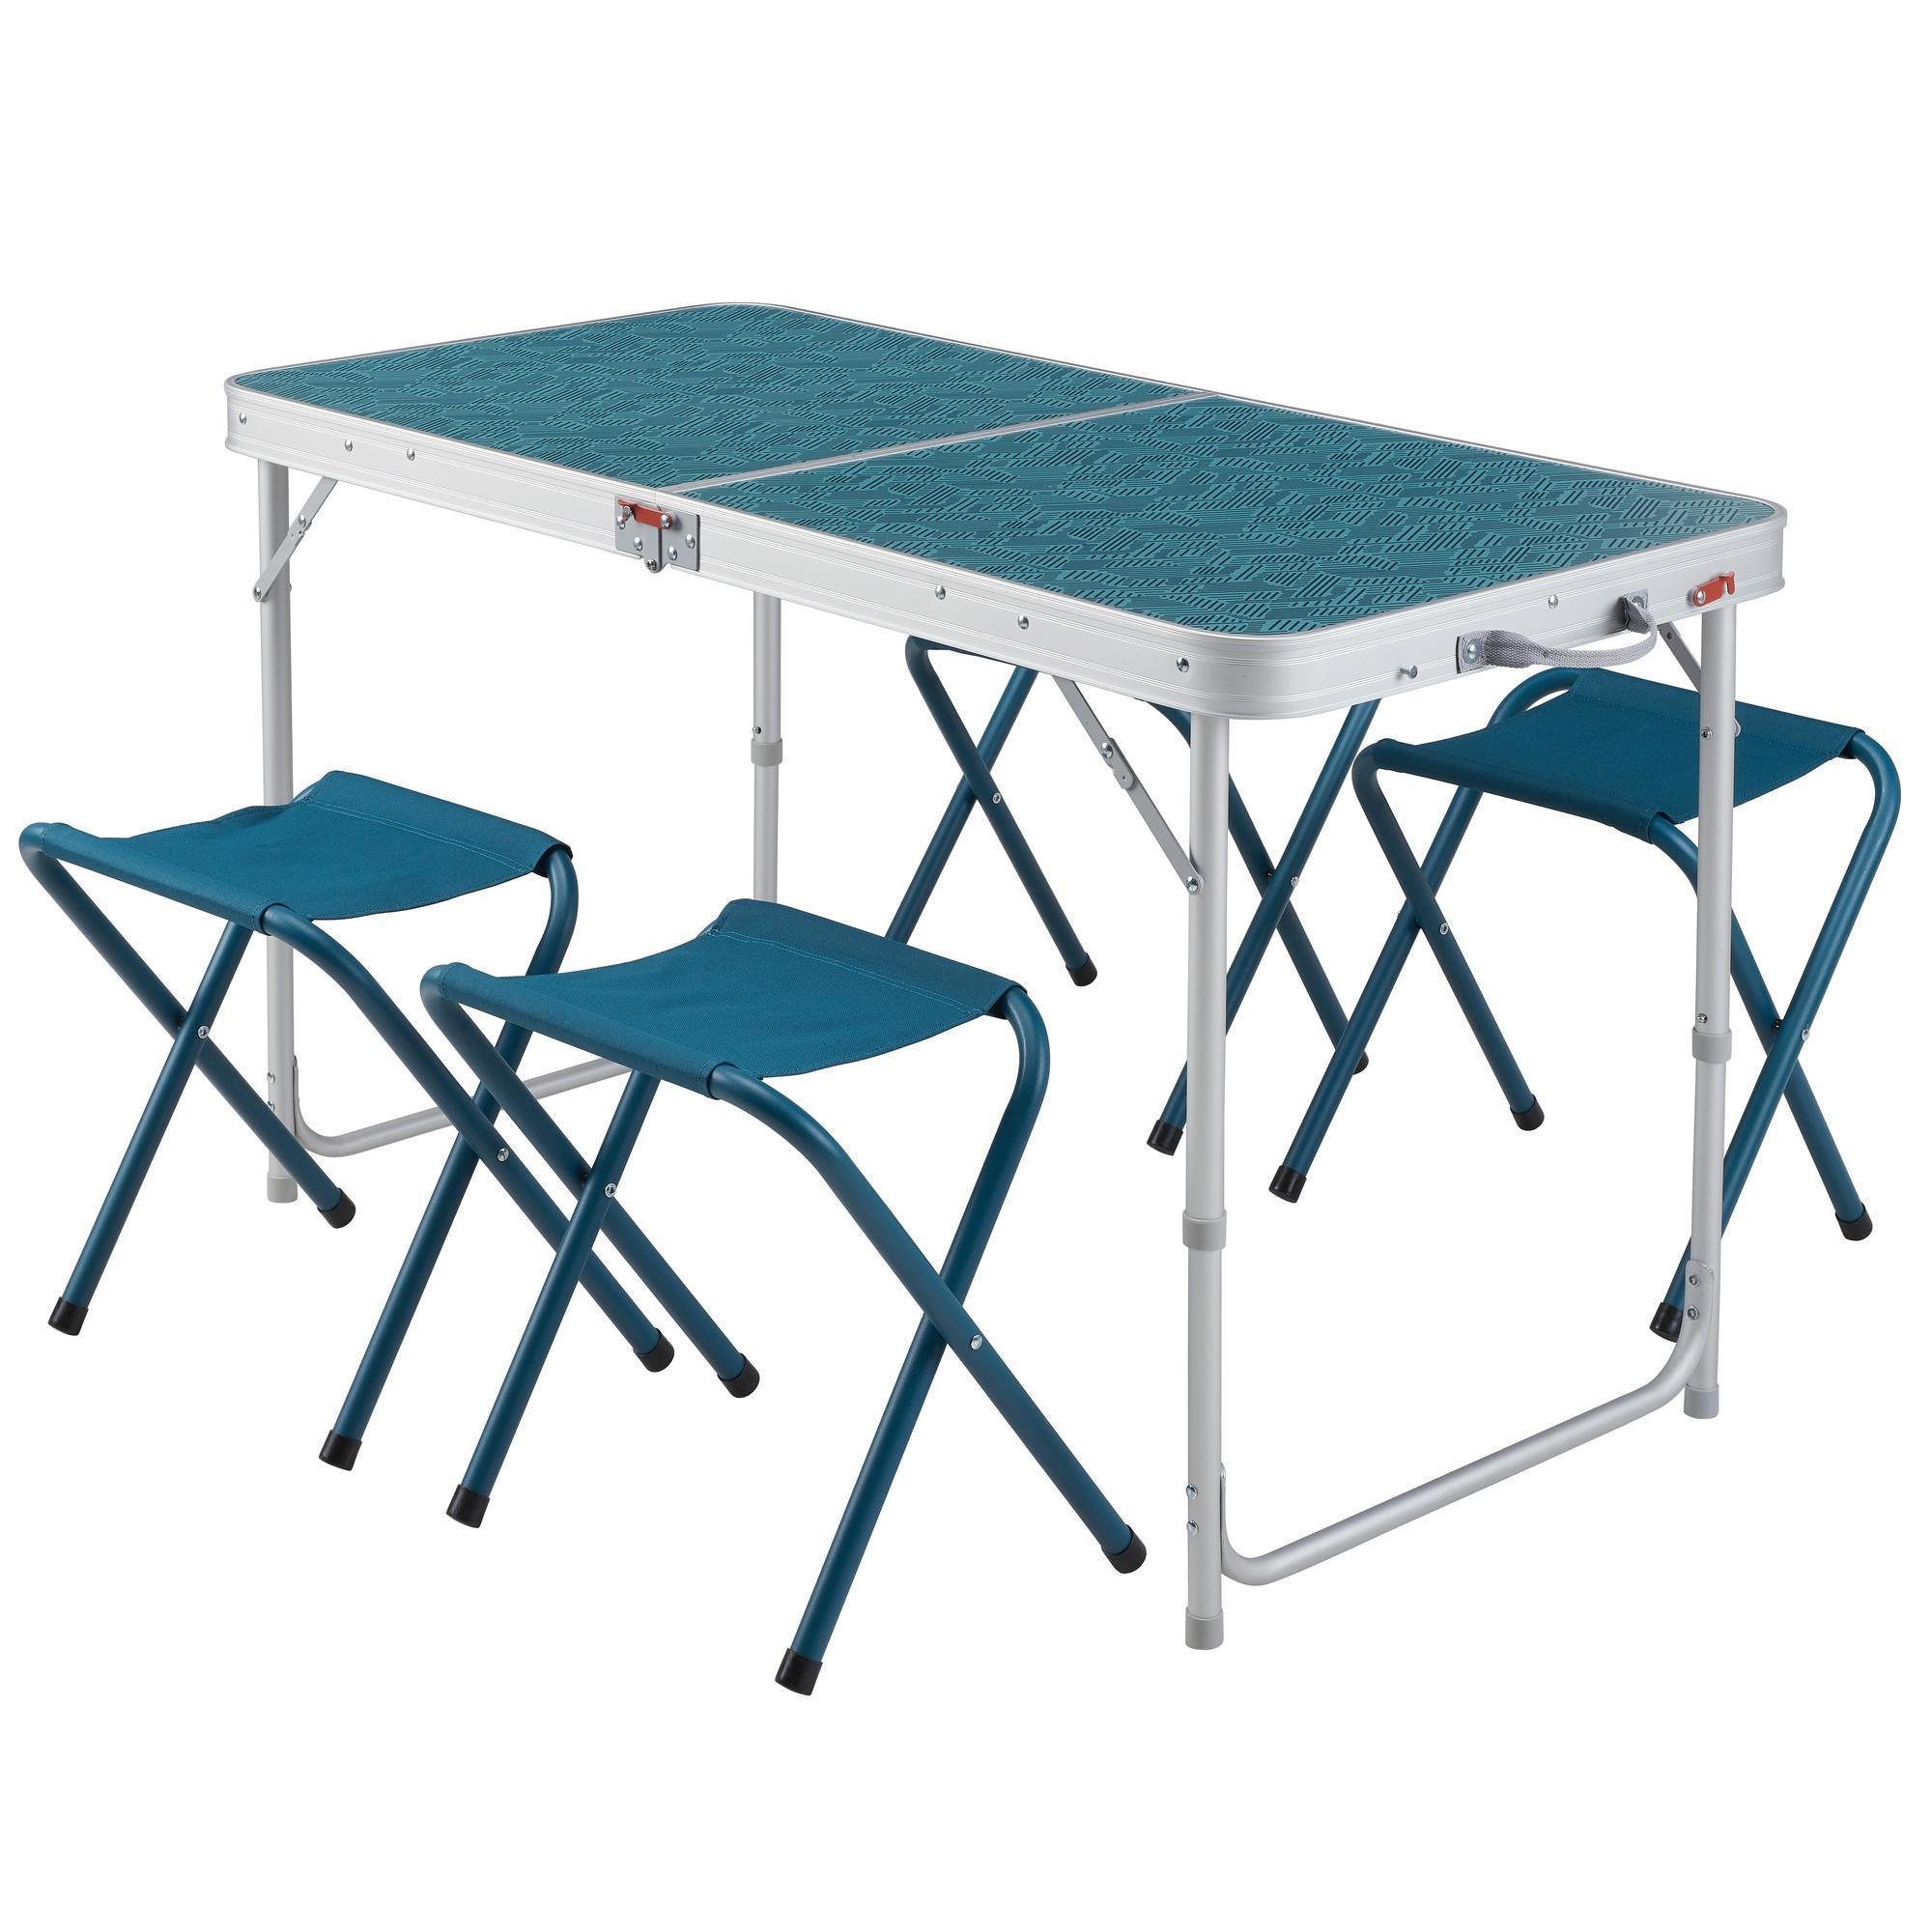 Camping Tables Cupboards Decathlon